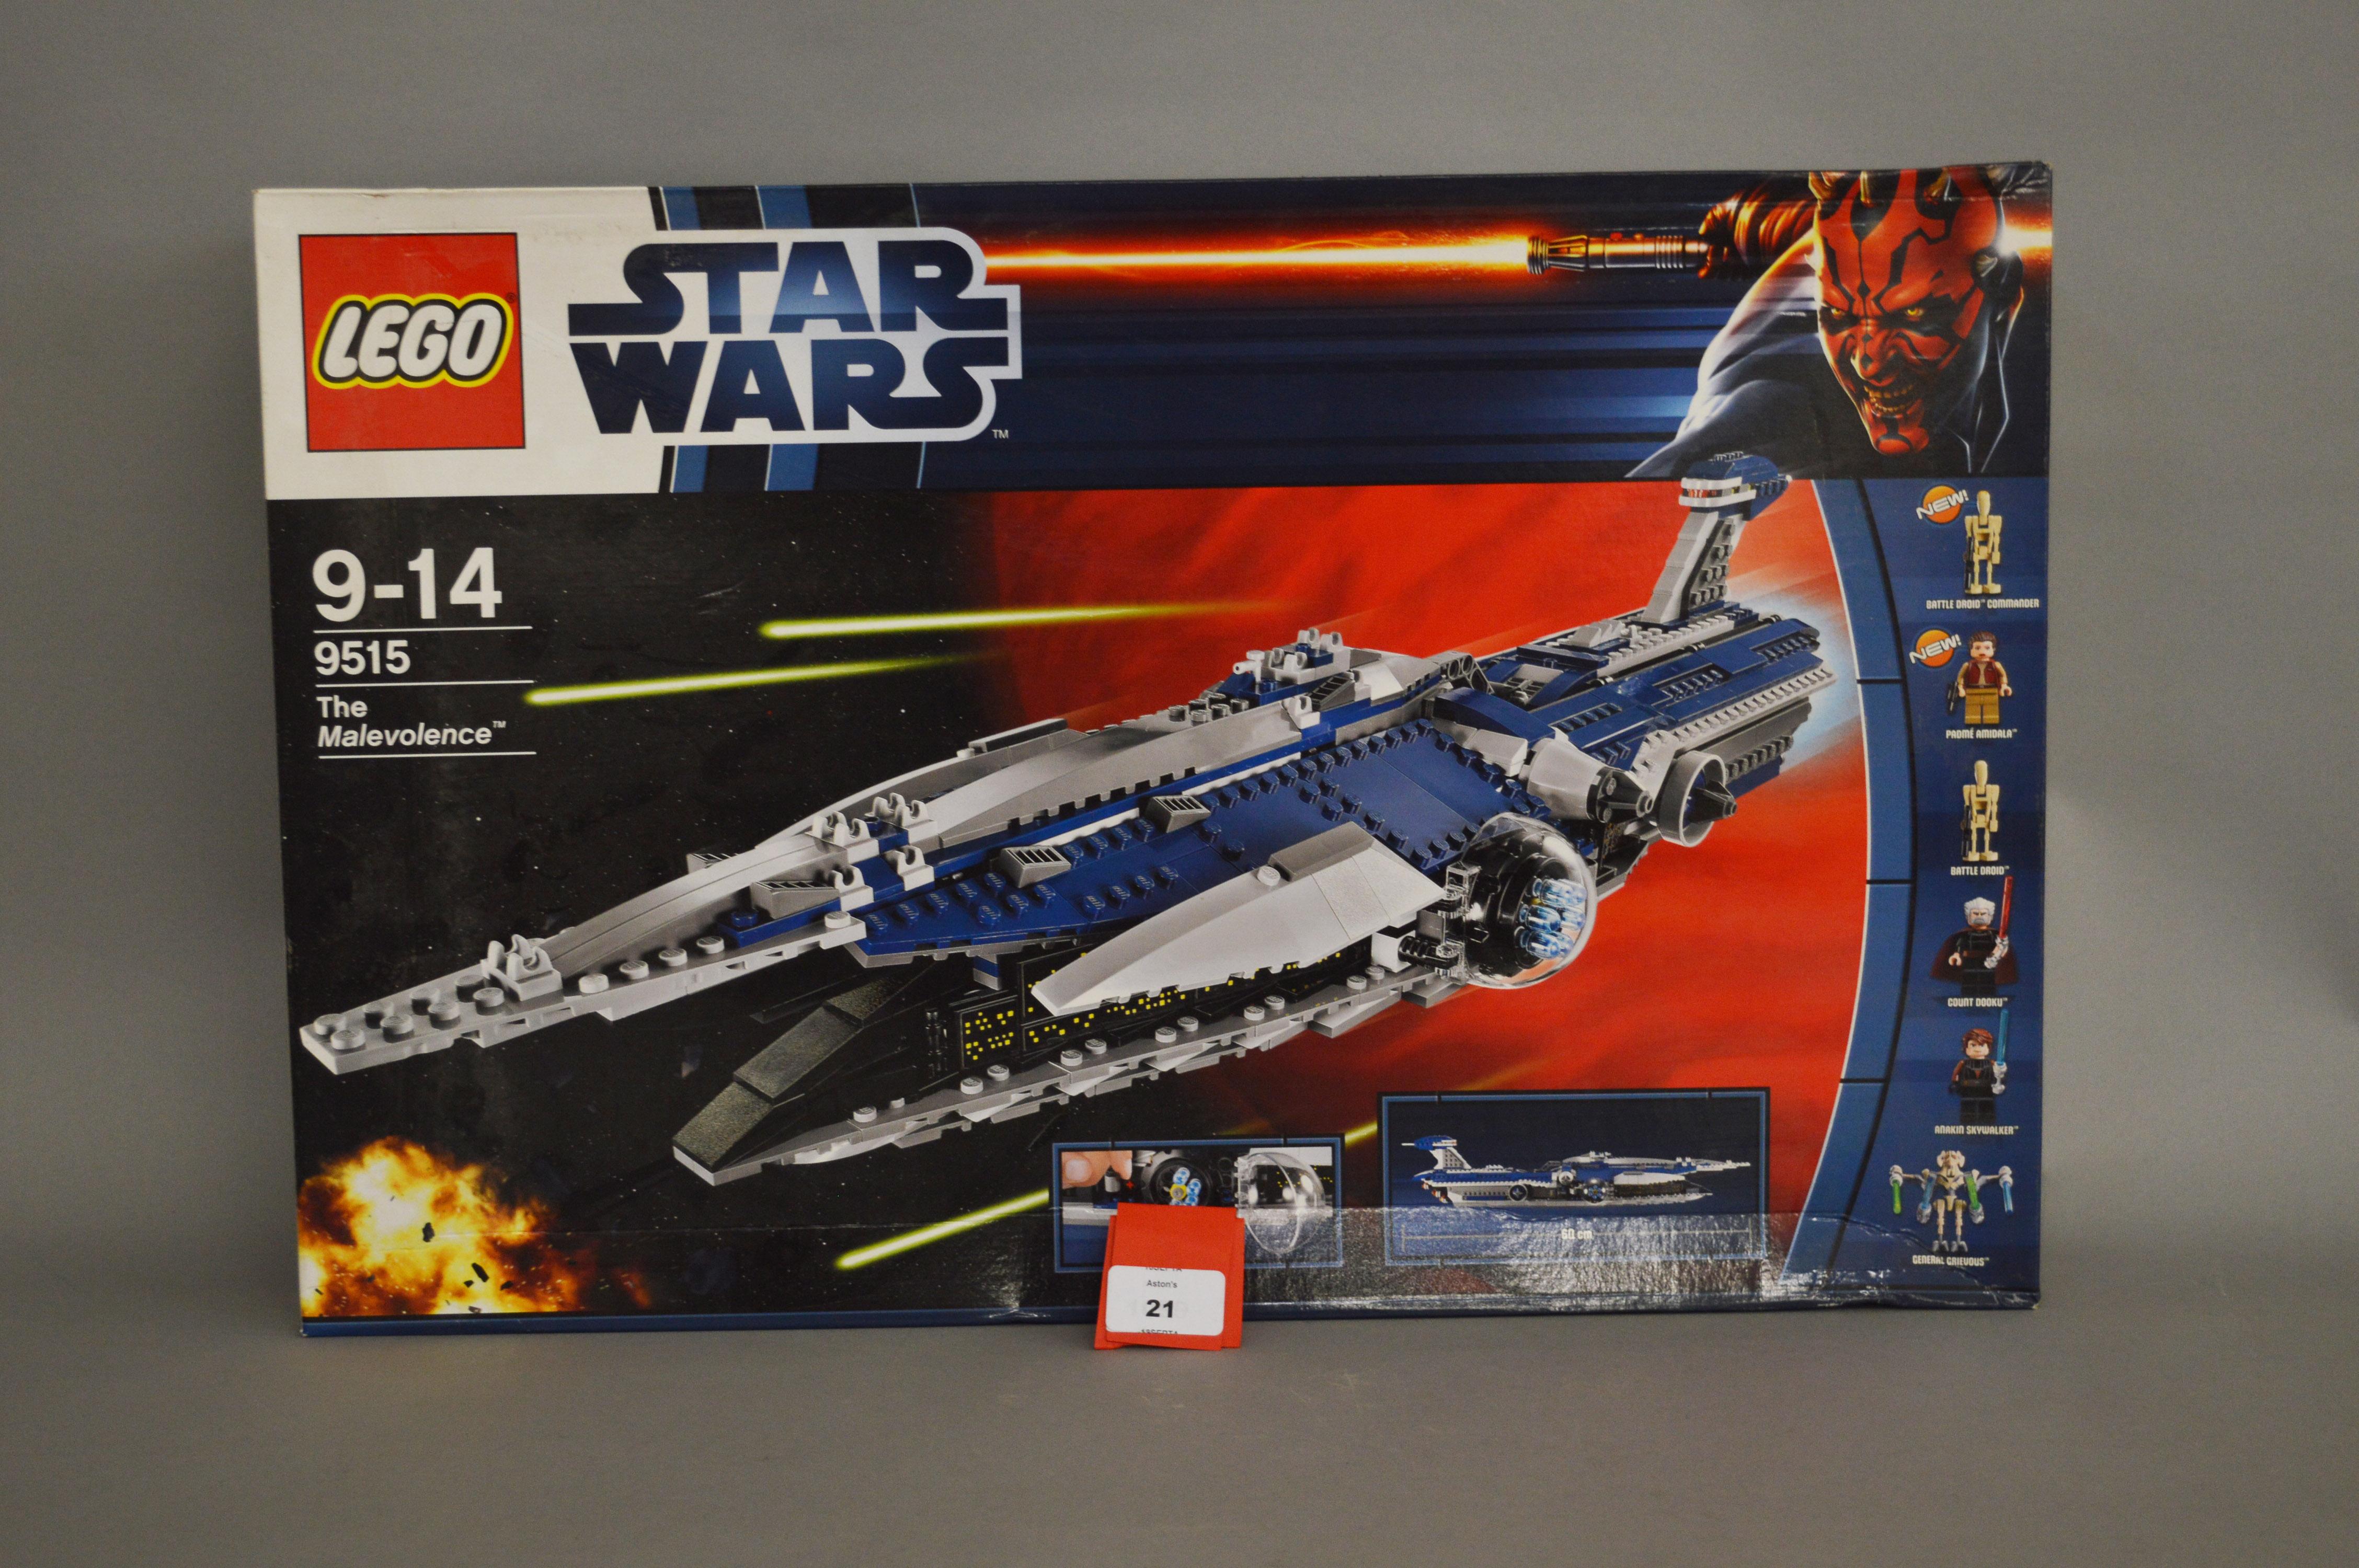 Lot 21 - Lego Star Wars 9515 'The Malevolence',